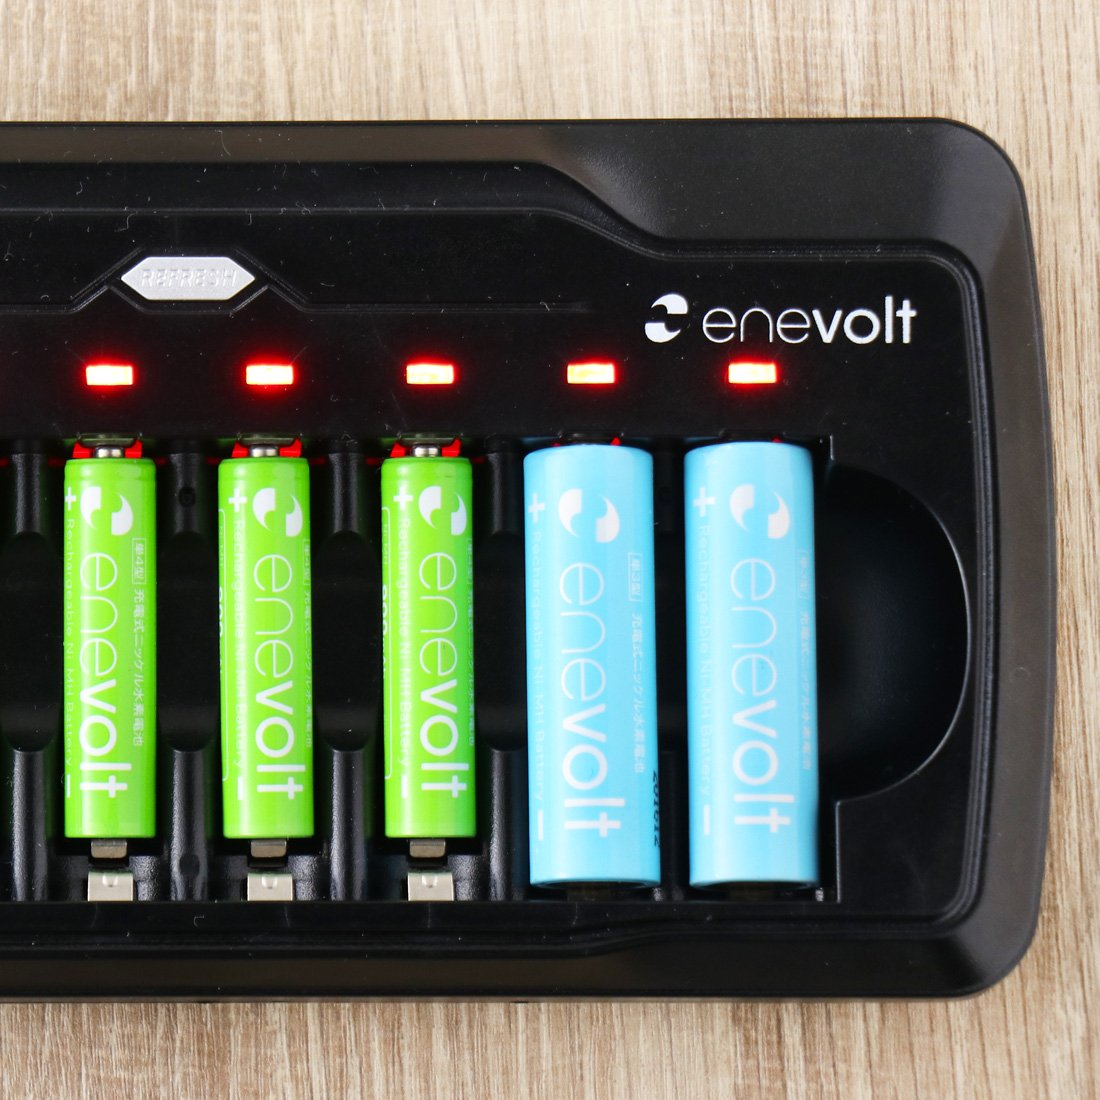 amazon エネボルト enevolt ニッケル水素 充電池用充電器 単3 単4